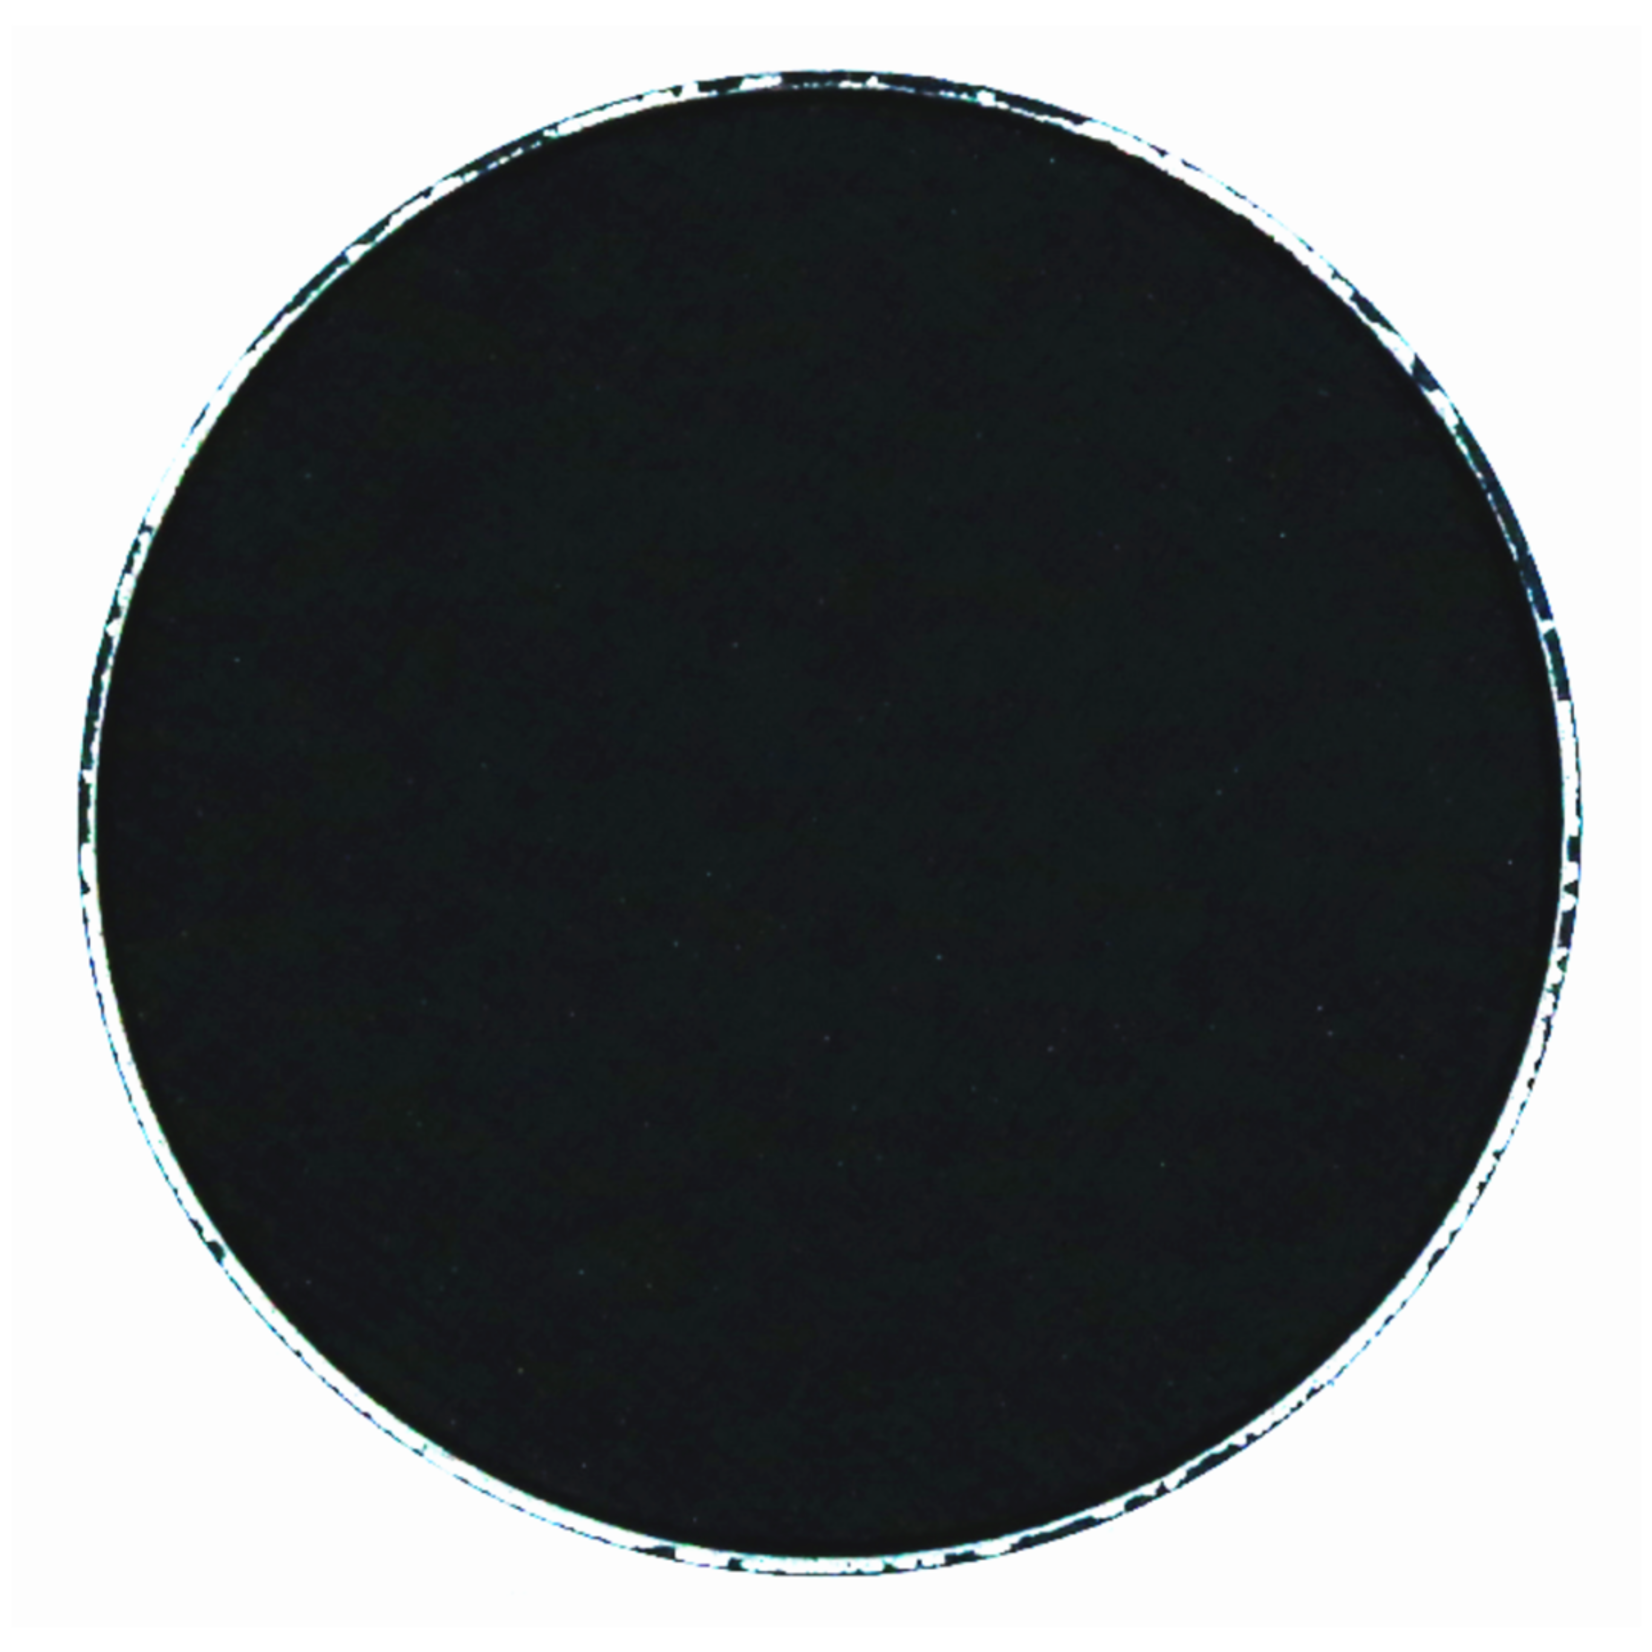 JKC EYESHADOW - Black Velvet